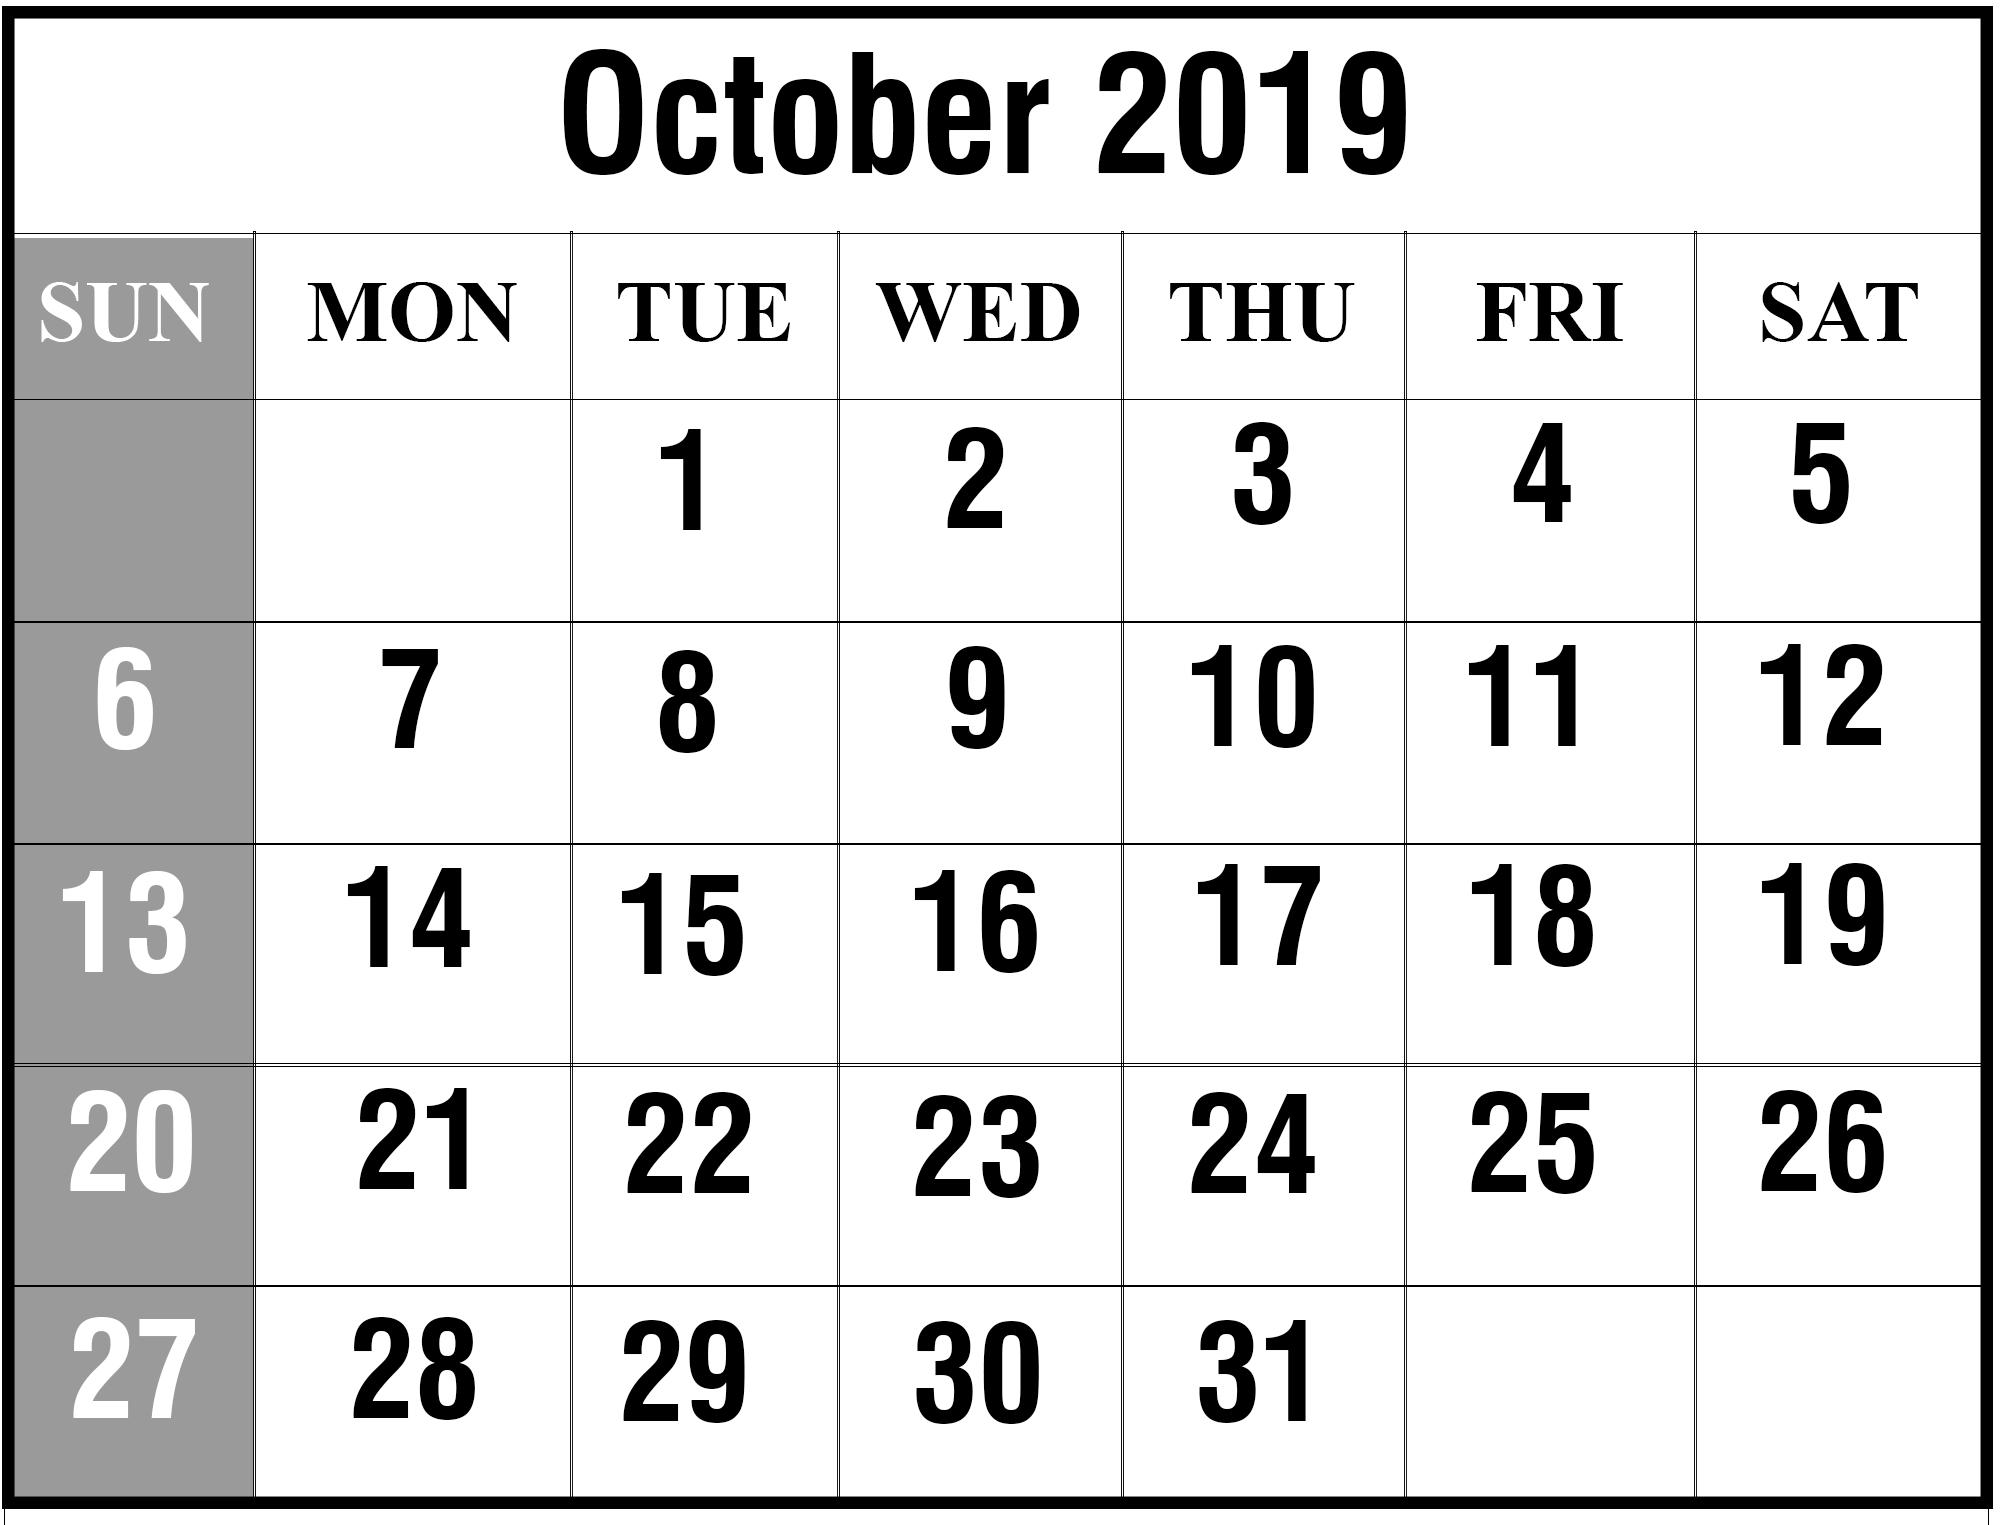 Printable October 2019 Calendar  Ram Singh  Medium with regard to Max 30 Calendar Pdf